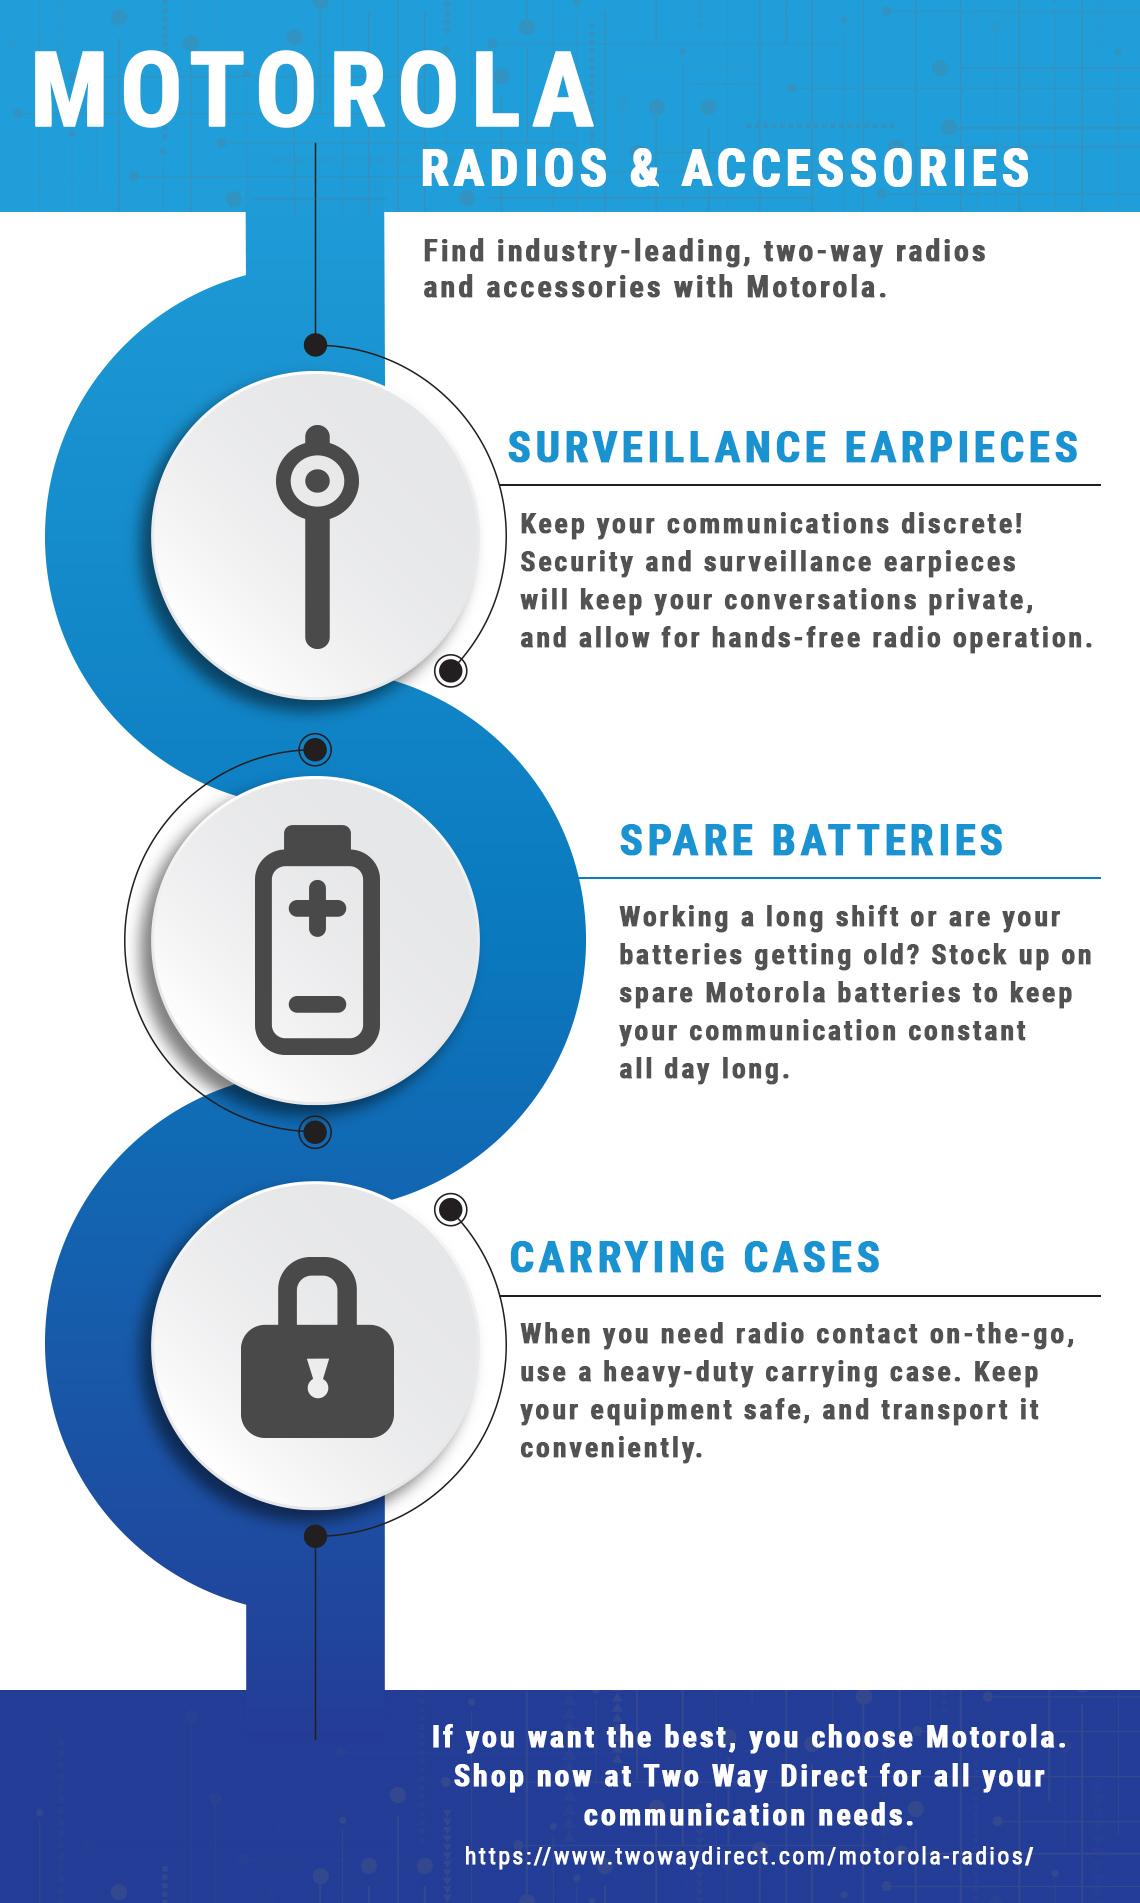 infographic-motorola.jpg